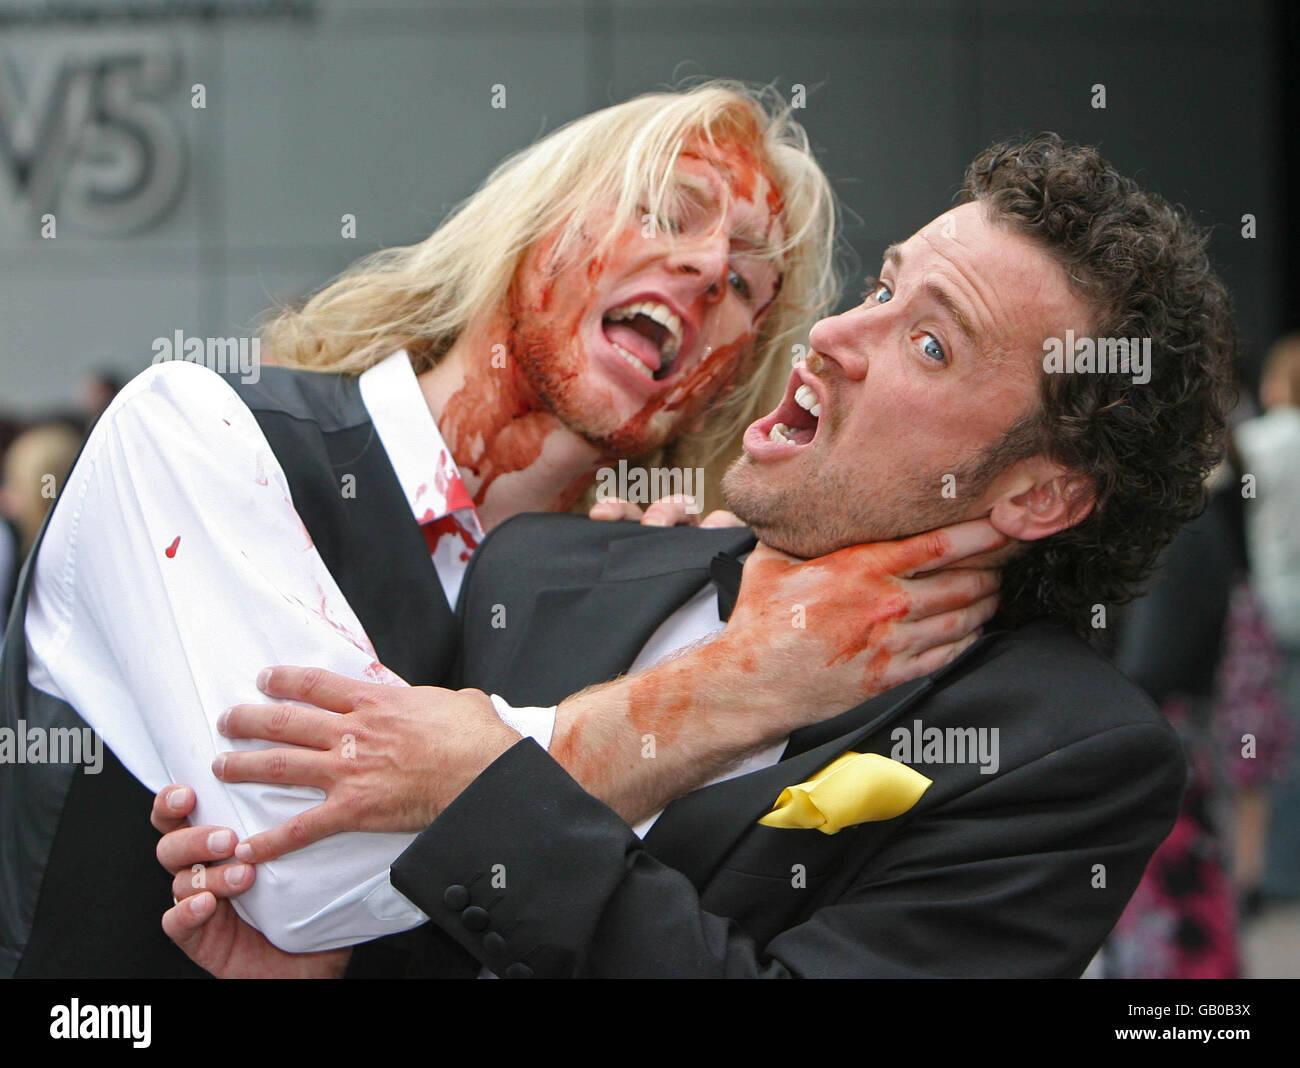 Belfast's first zombie horror film Stock Photo